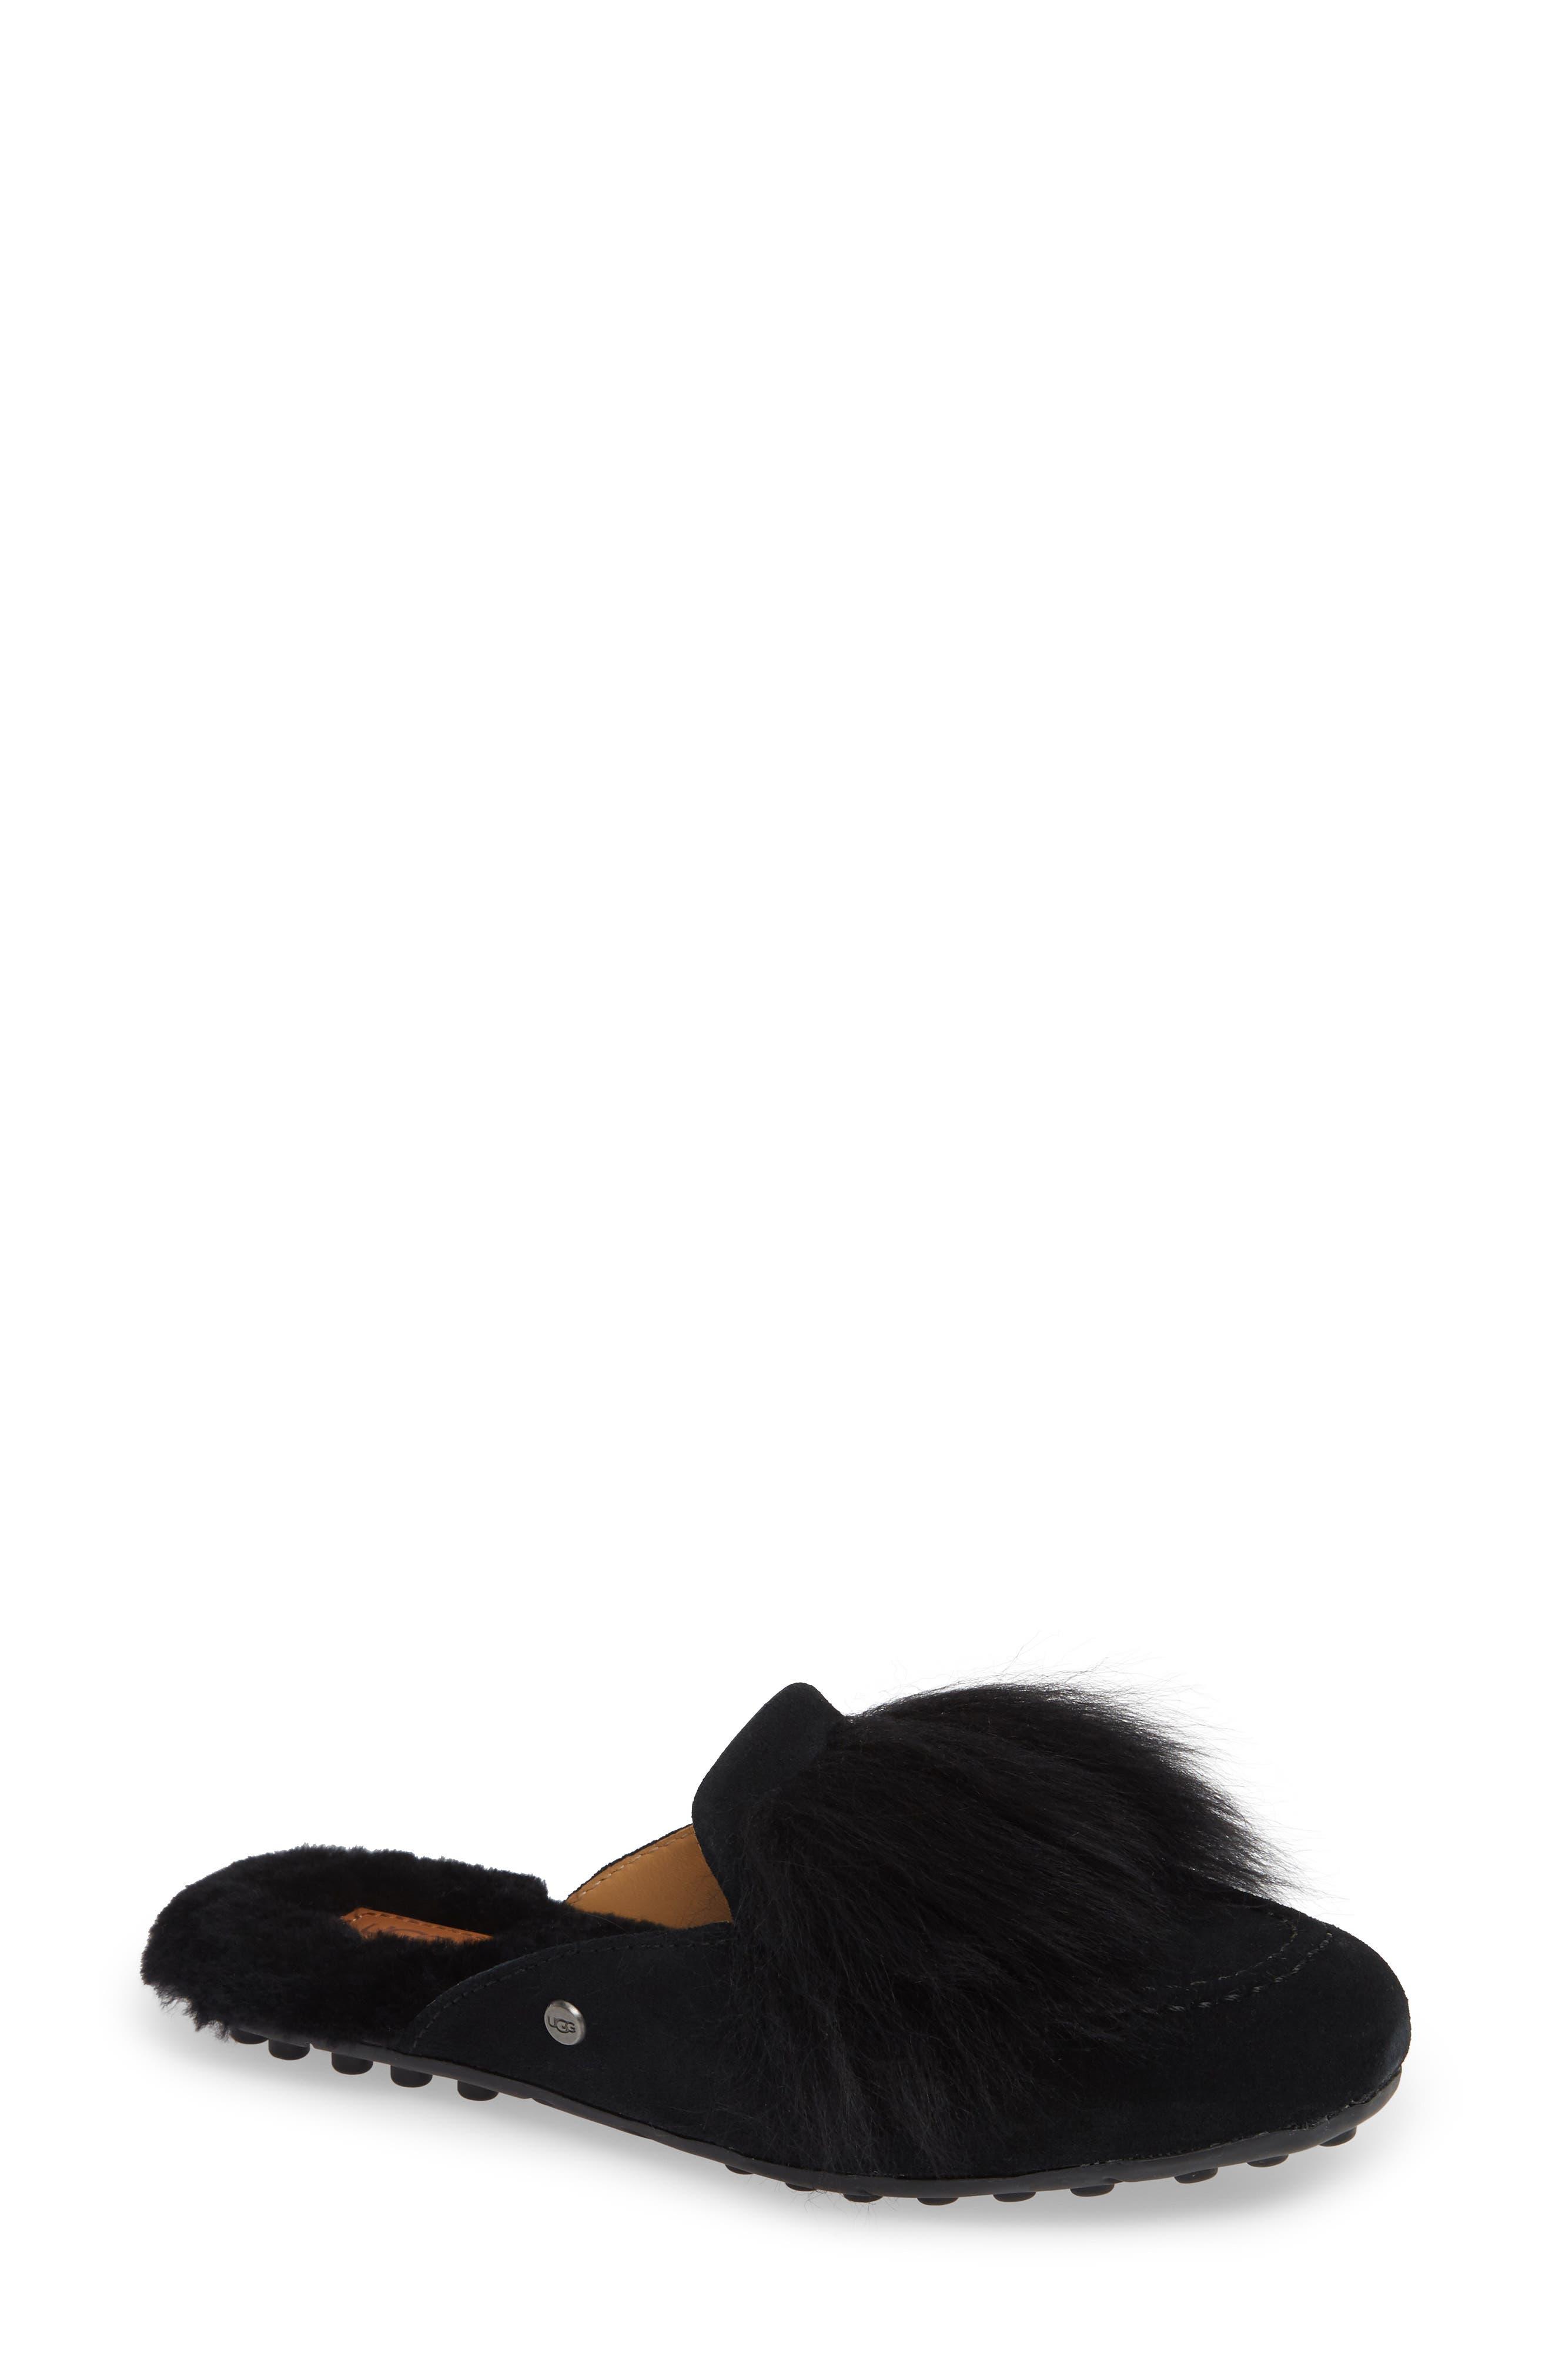 Ugg Shaine Wisp Genuine Shearling Slipper, Black